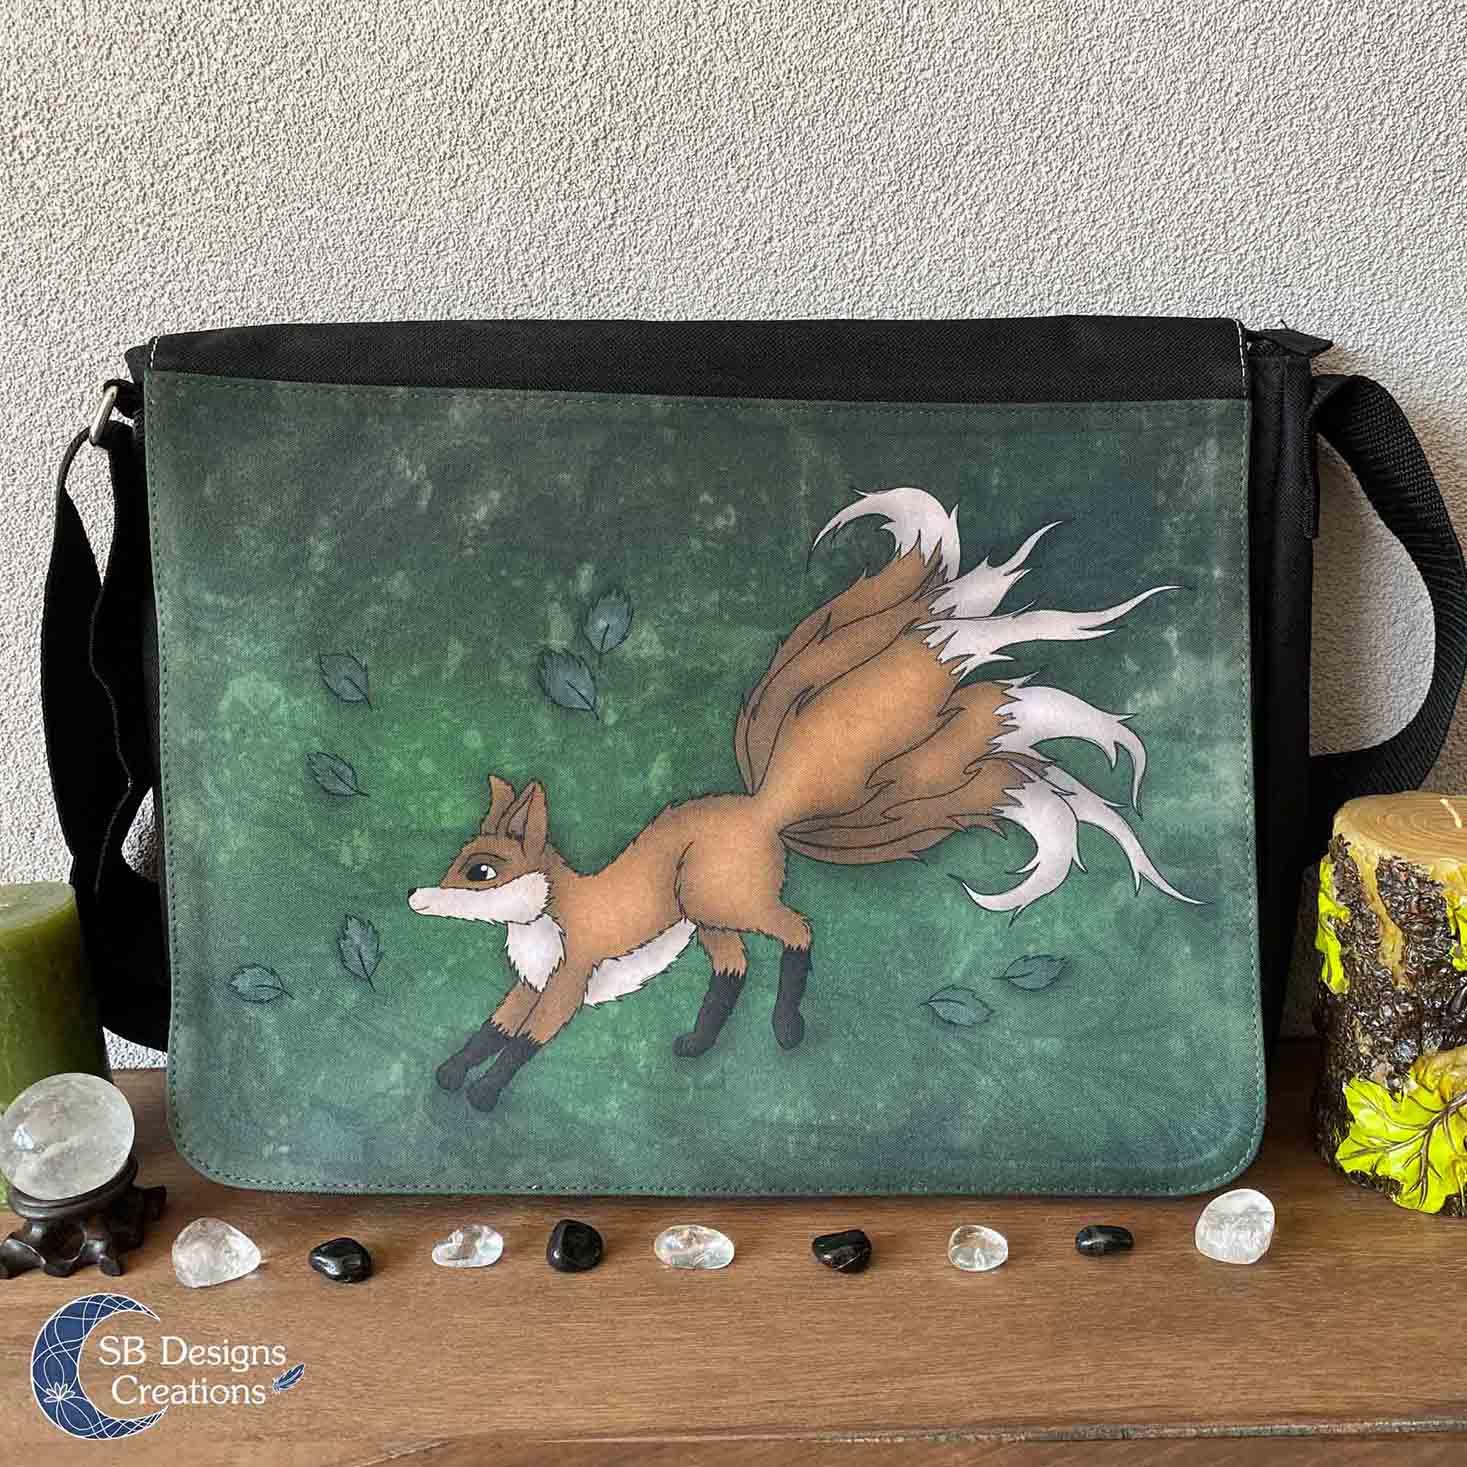 Kitsune-Vos-Tas-Schoudertas-Spirit-Creature-Bag-1